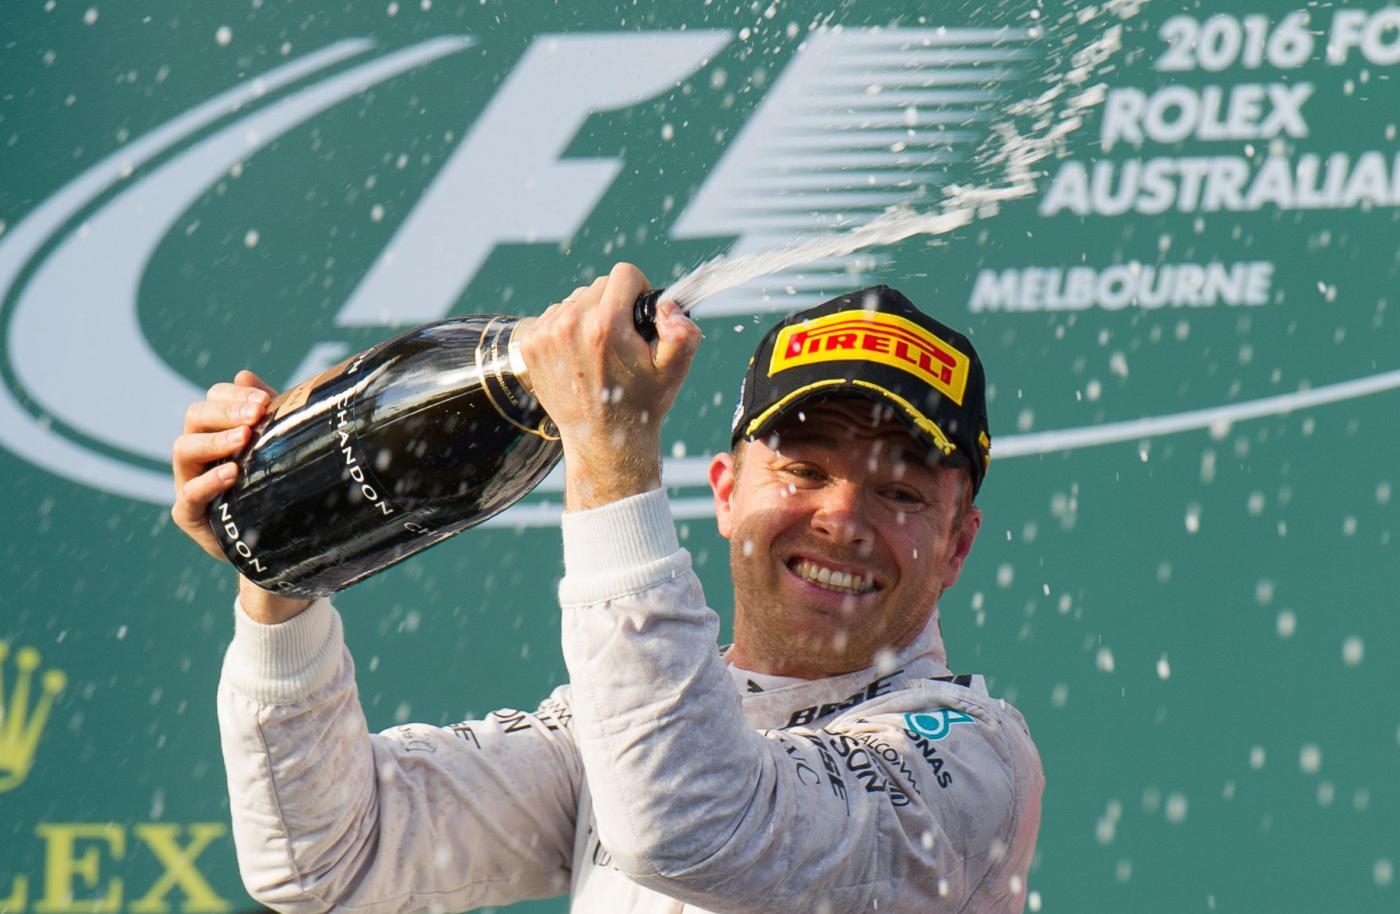 F1, Gp Australia: vince Rosberg davanti a Hamilton, terzo Vettel